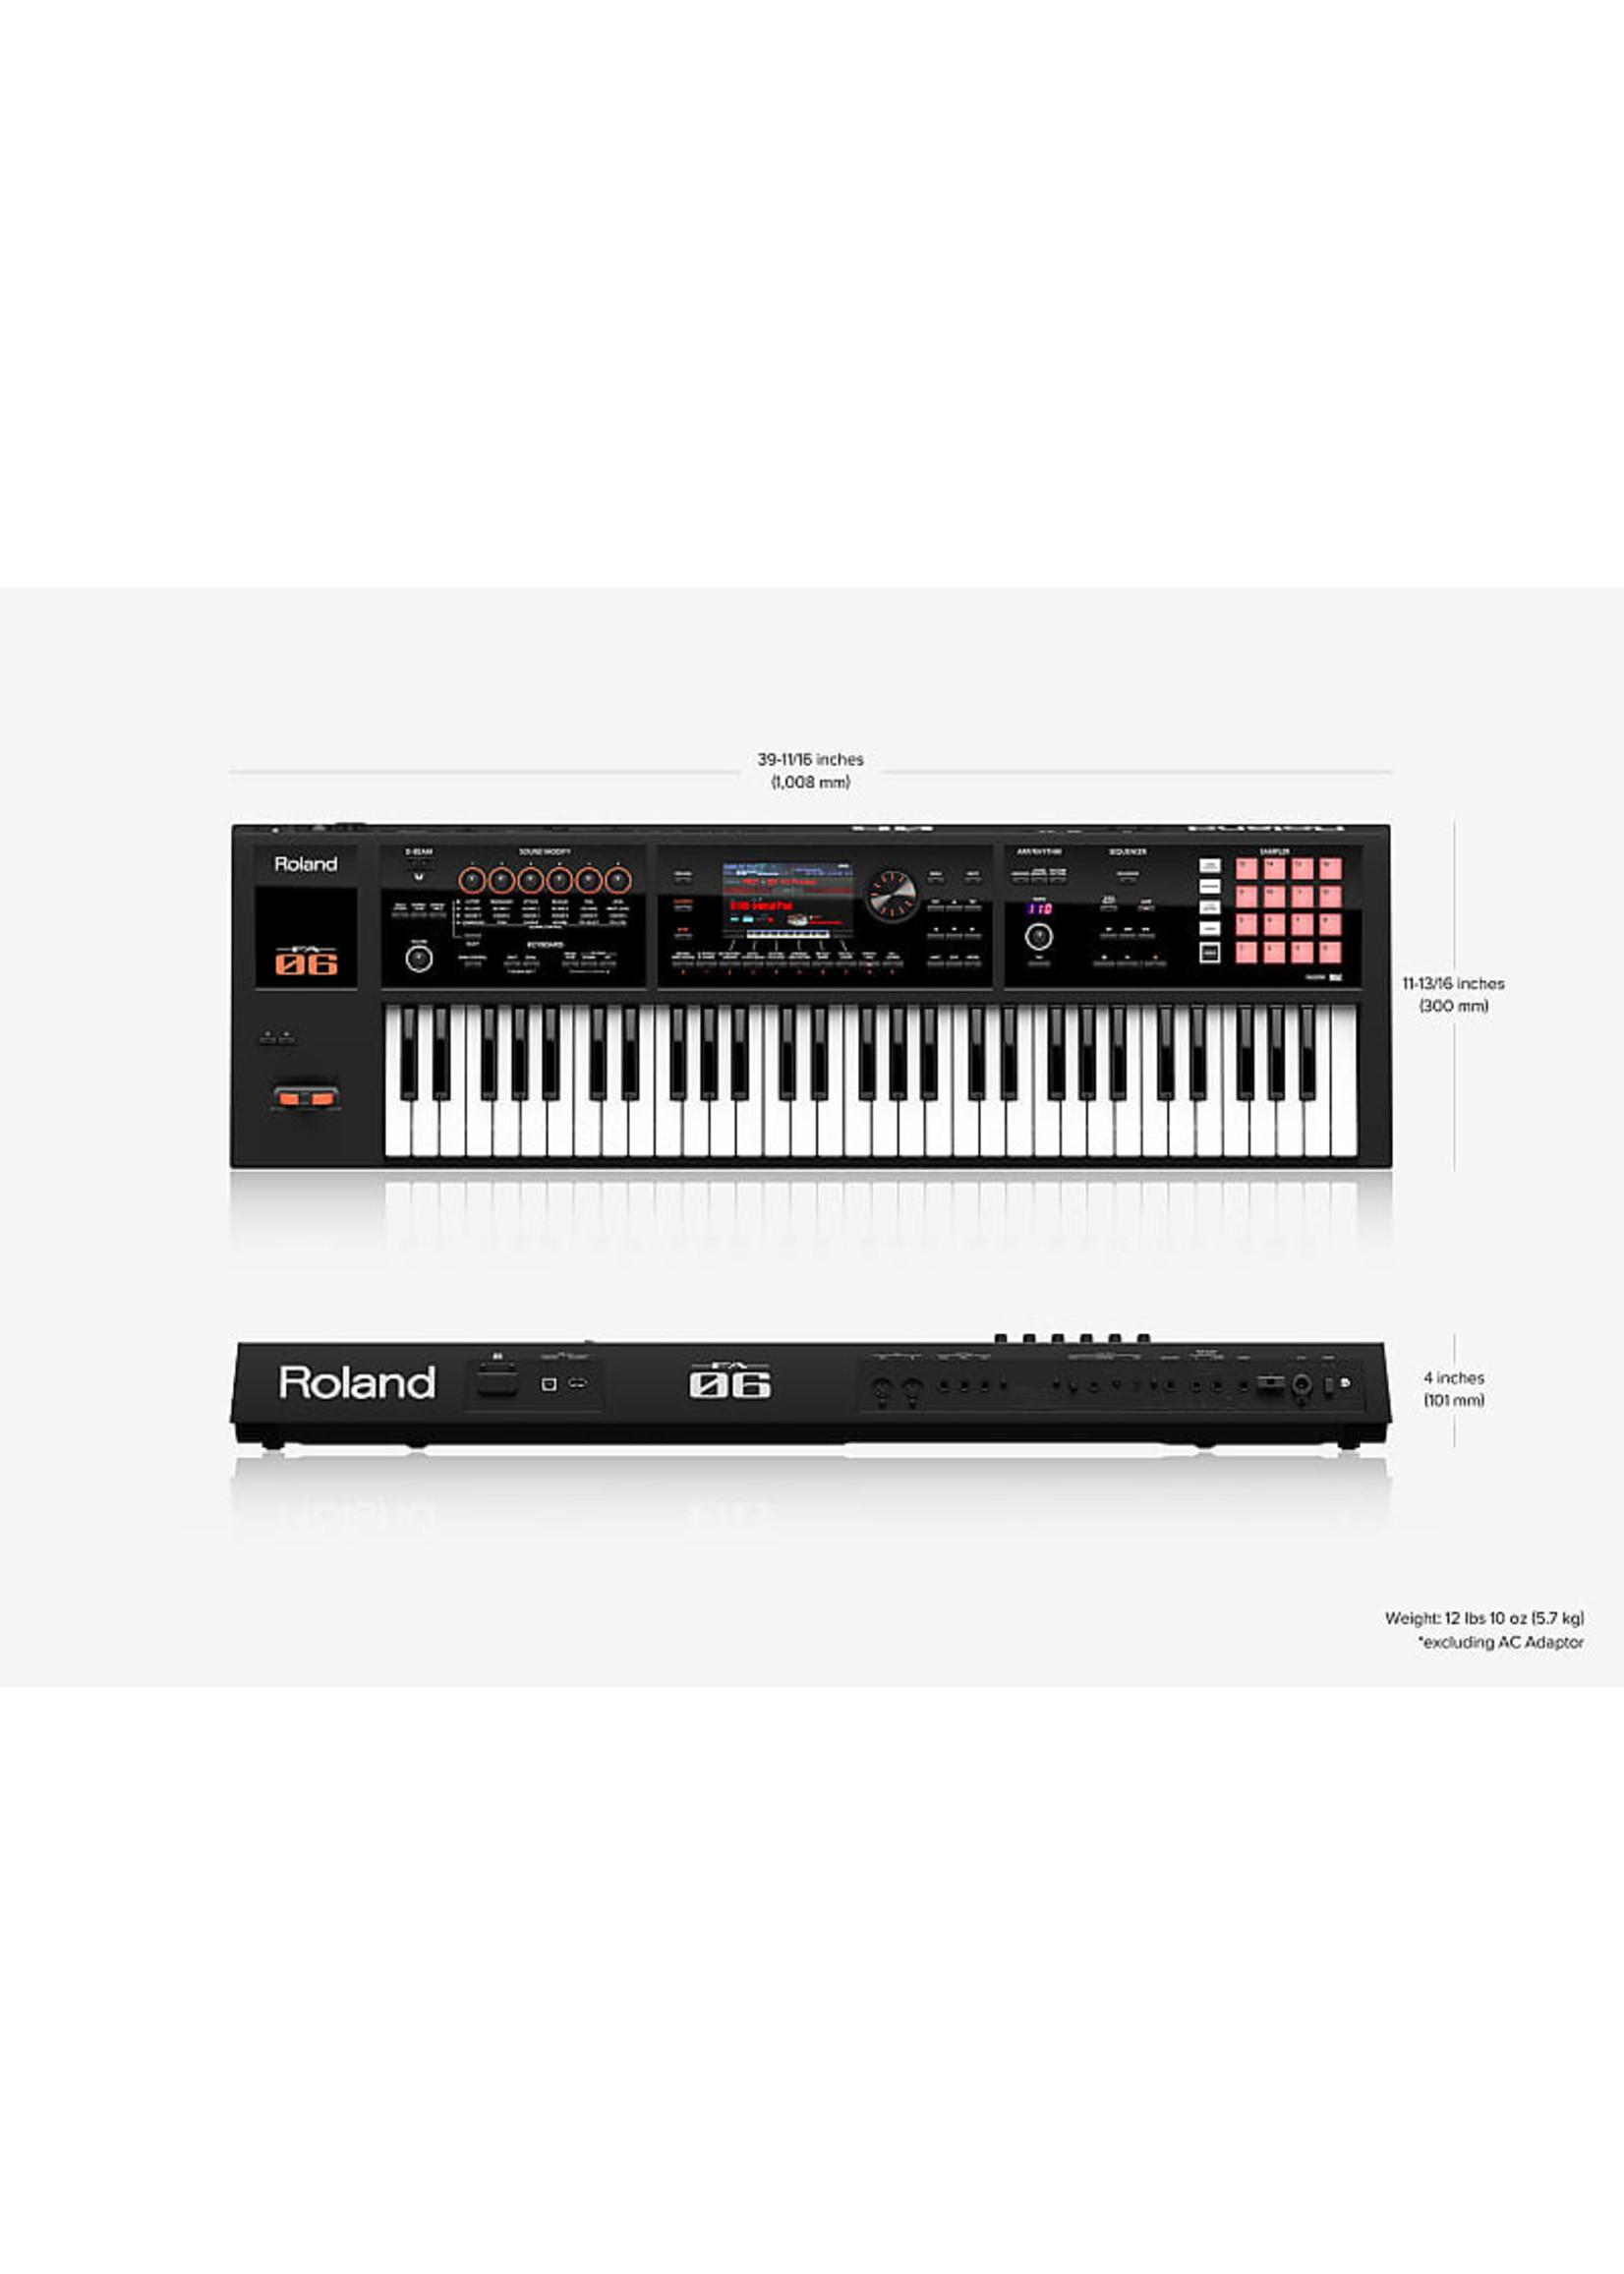 Roland Roland FA-06 Music Workstation